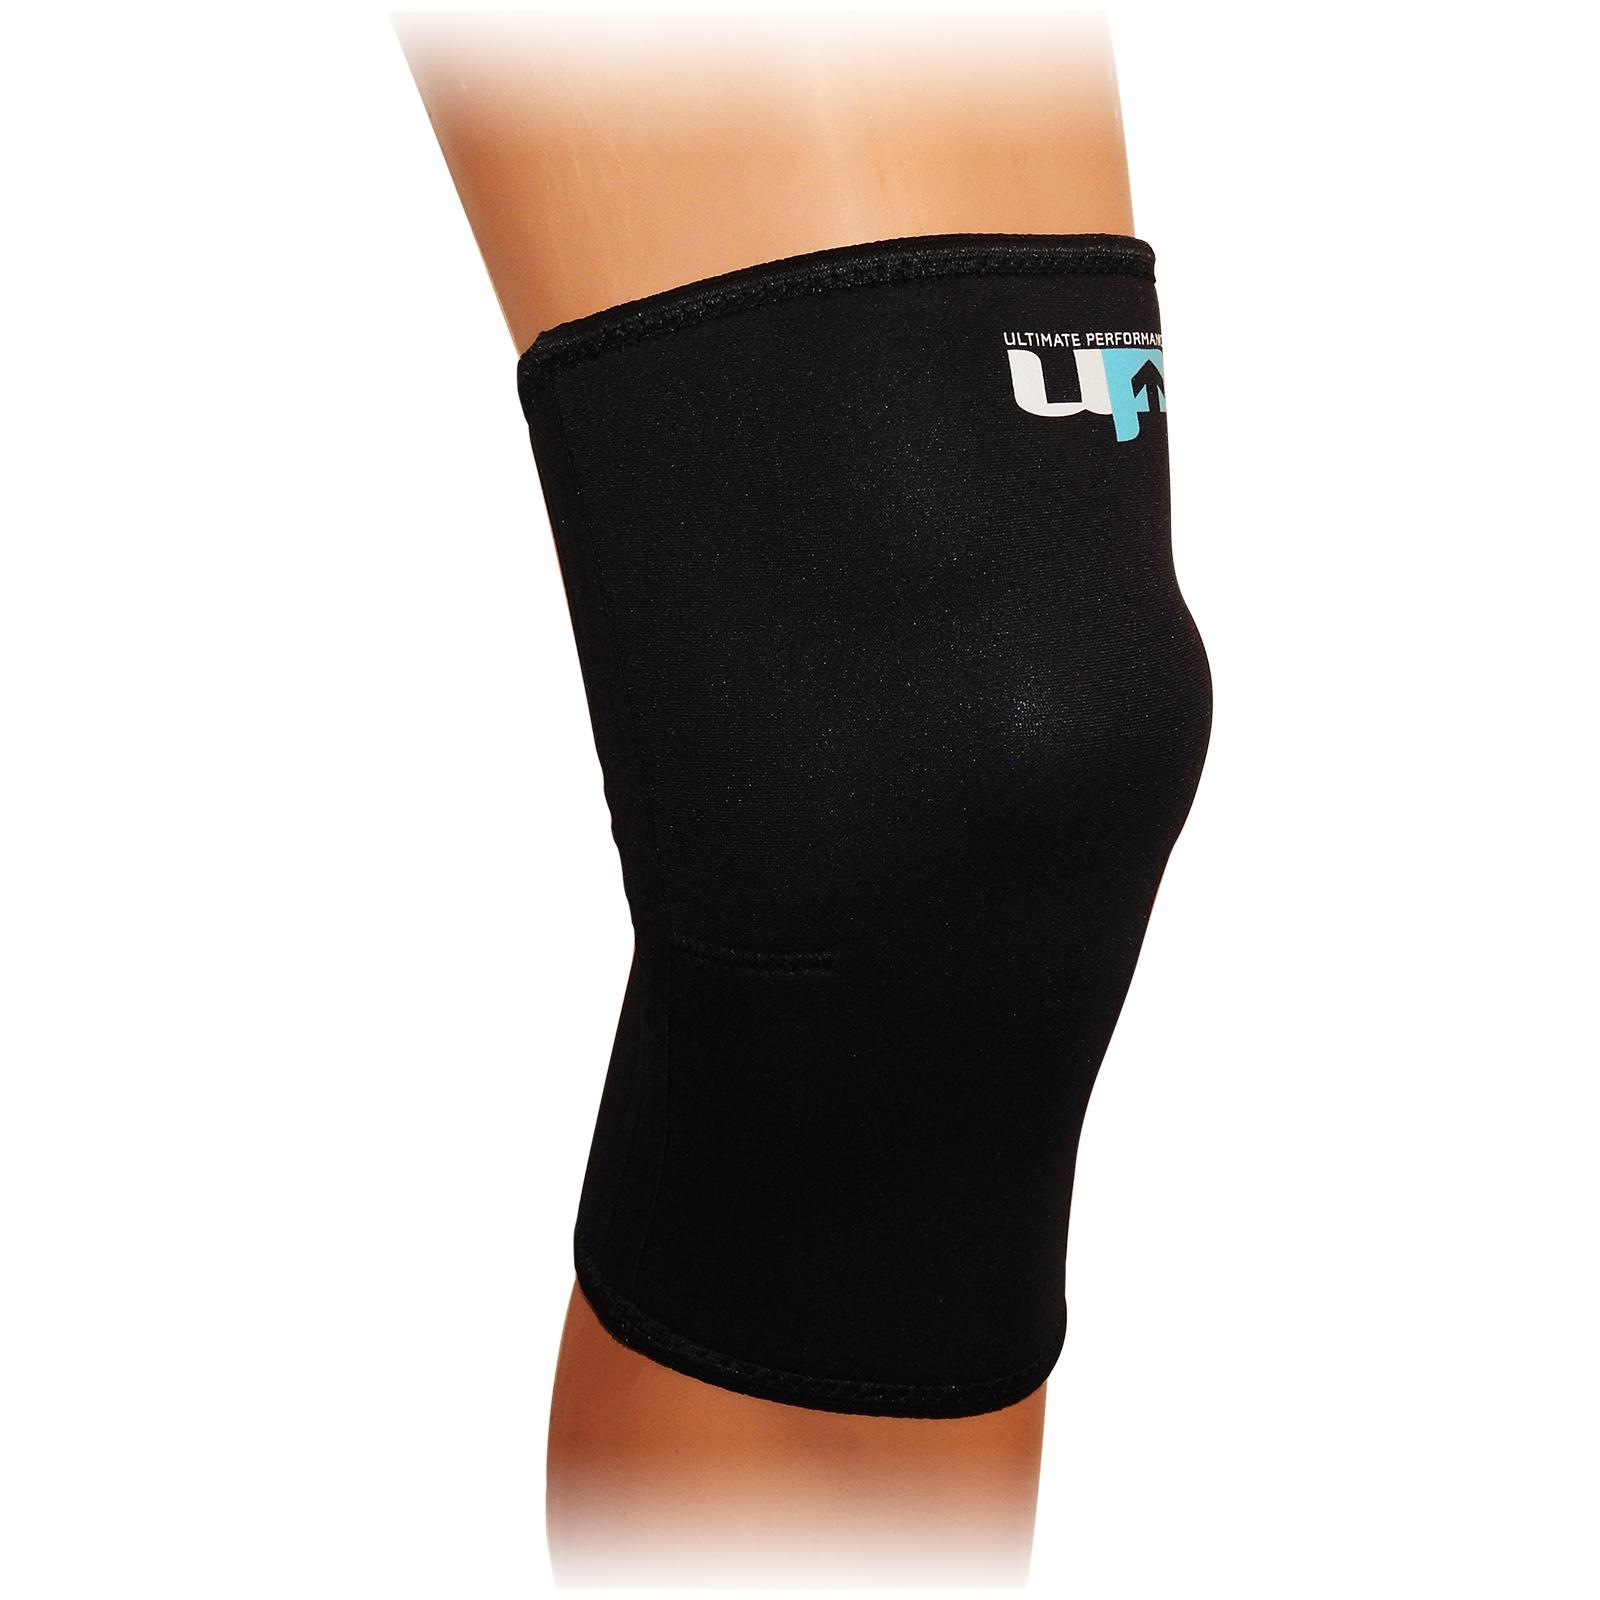 Ultimate Performance Ultimate Unisex Black Compression Elastic Knee Support